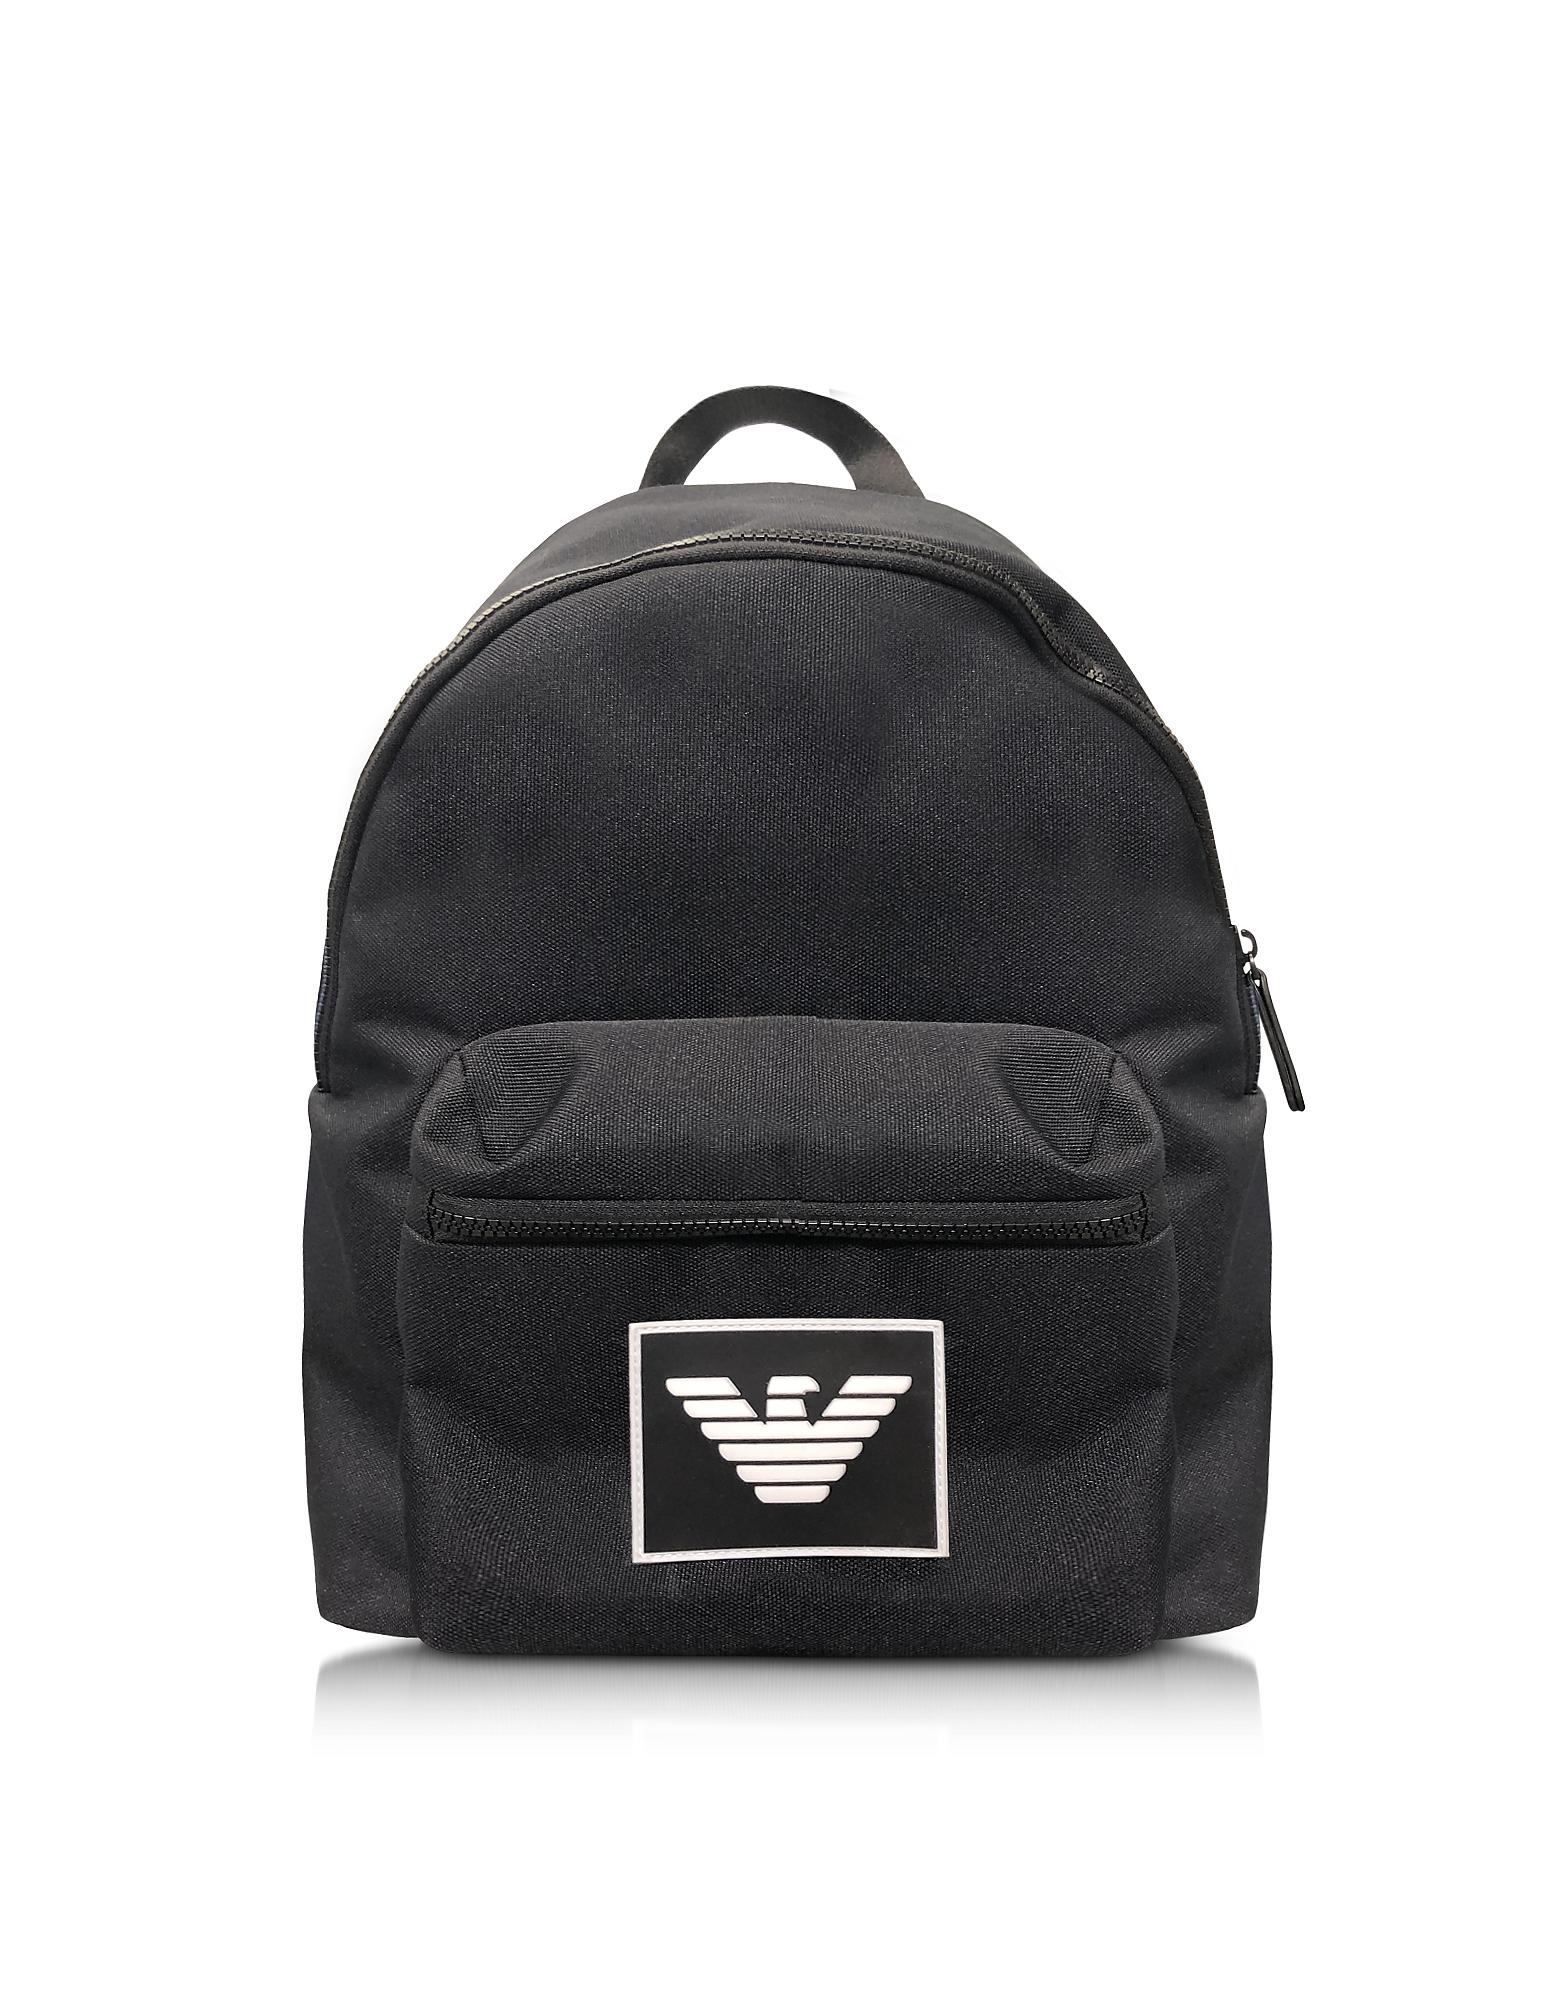 Signature Ribbon Backpack, Black